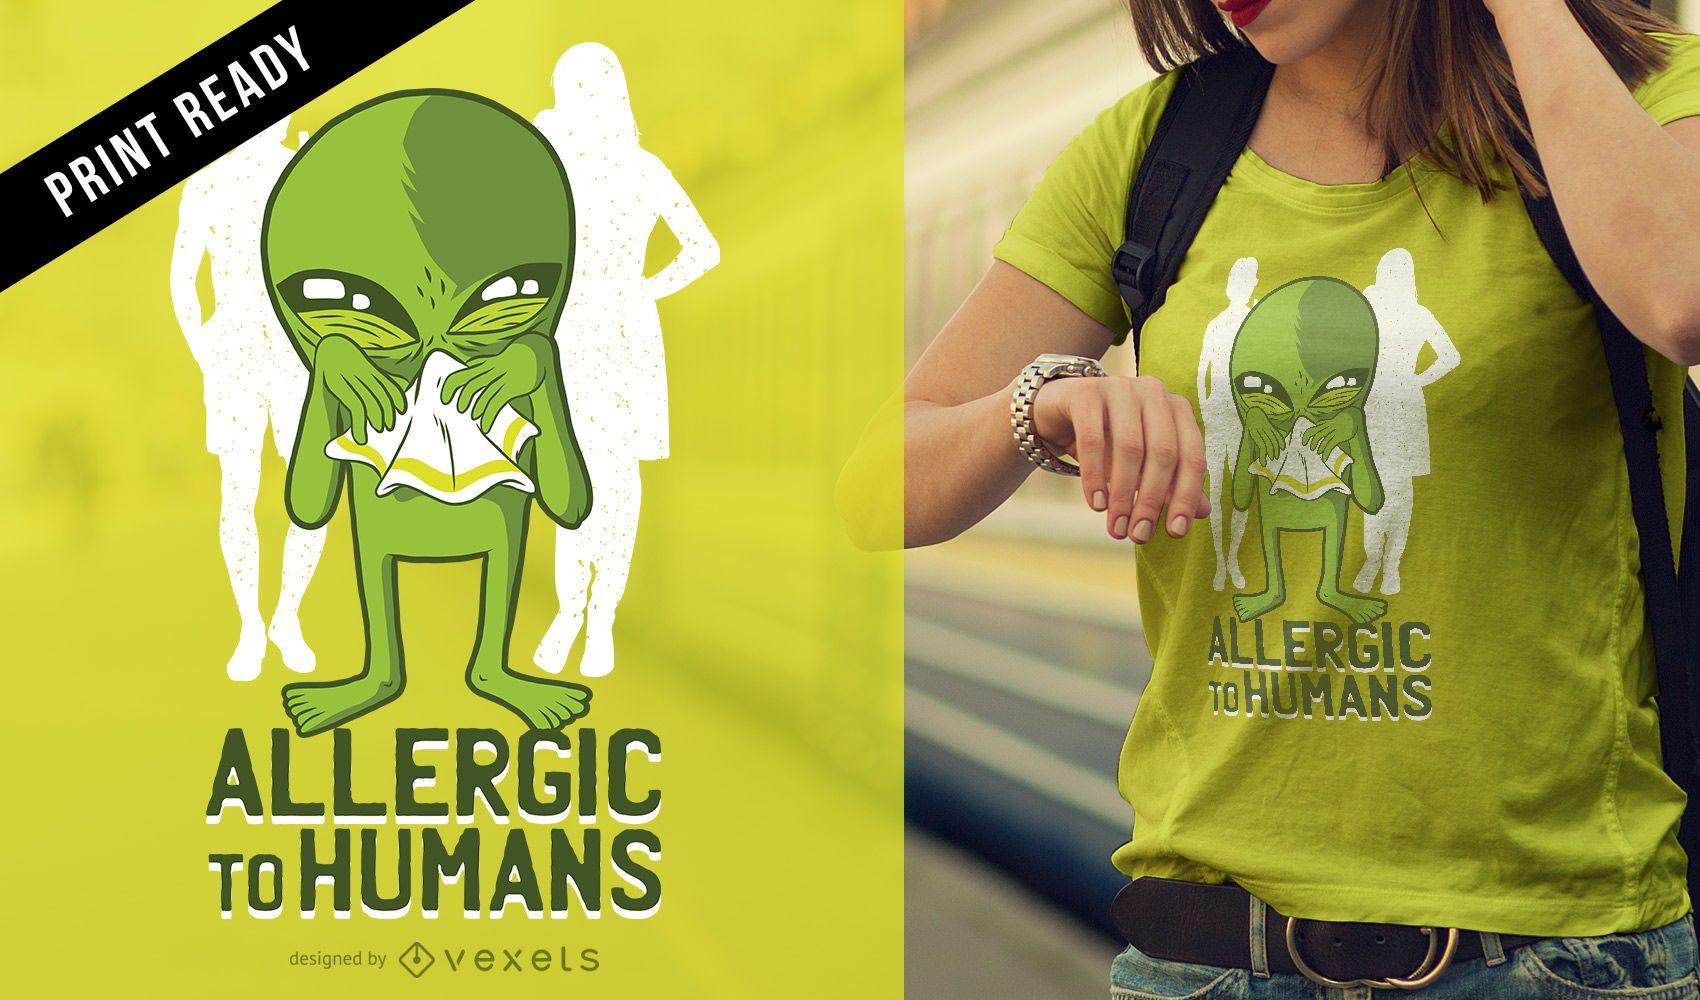 Allergic to humans t-shirt design